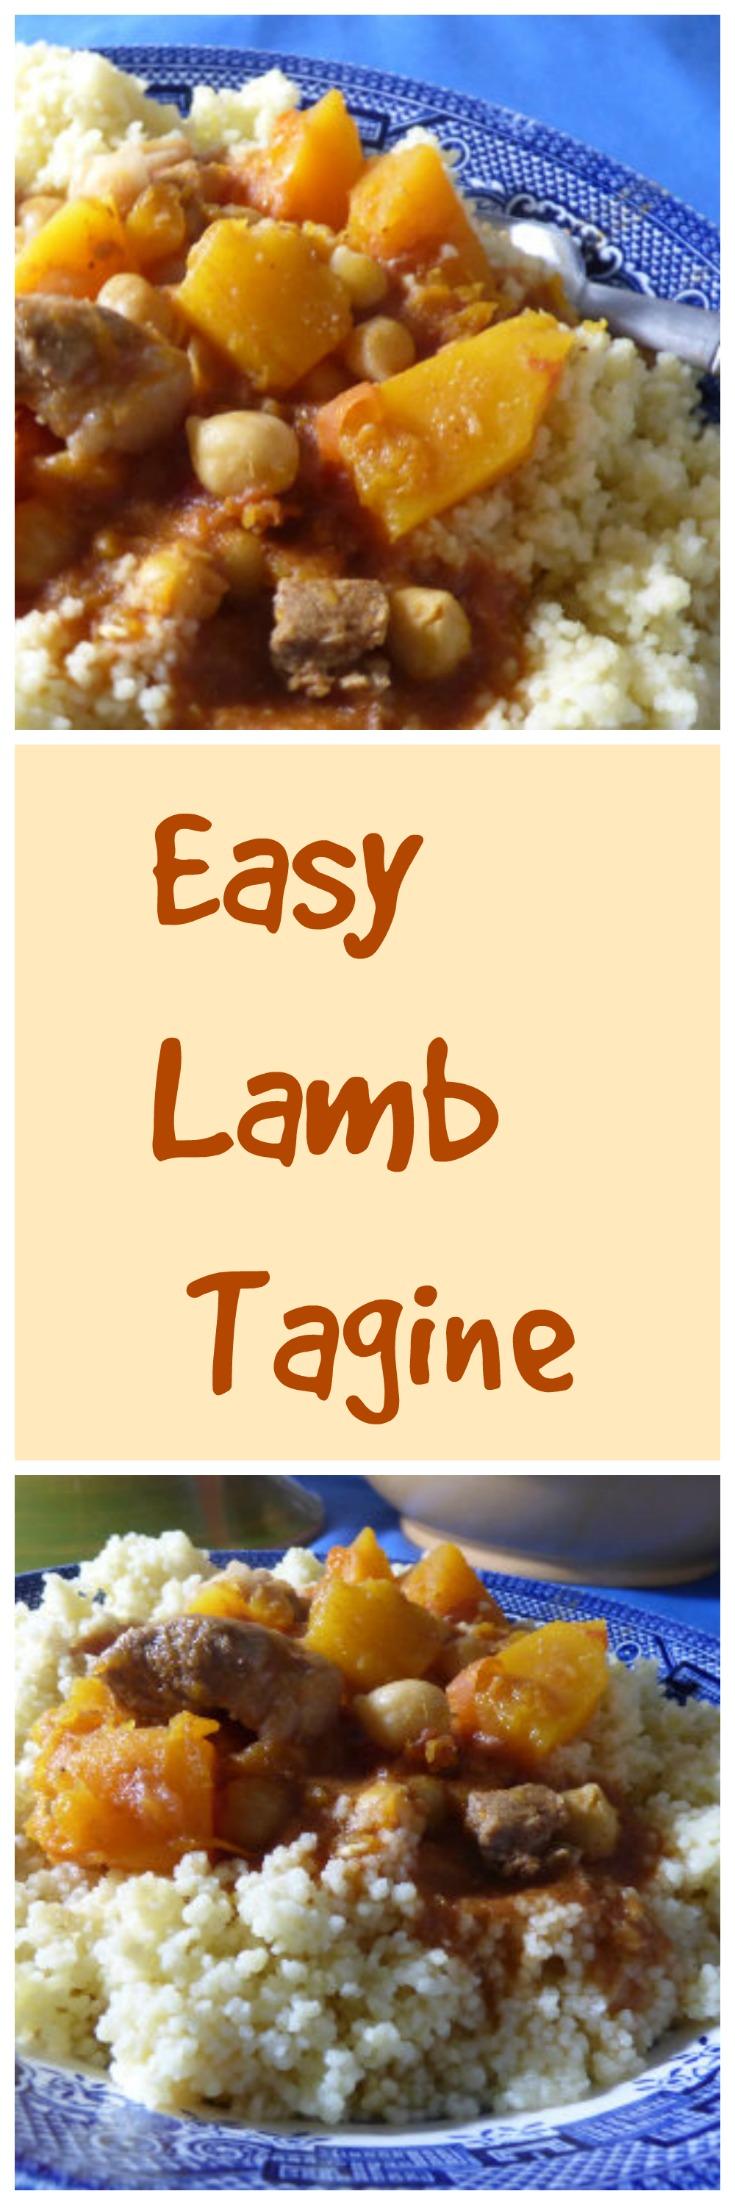 easy lamb tagine long